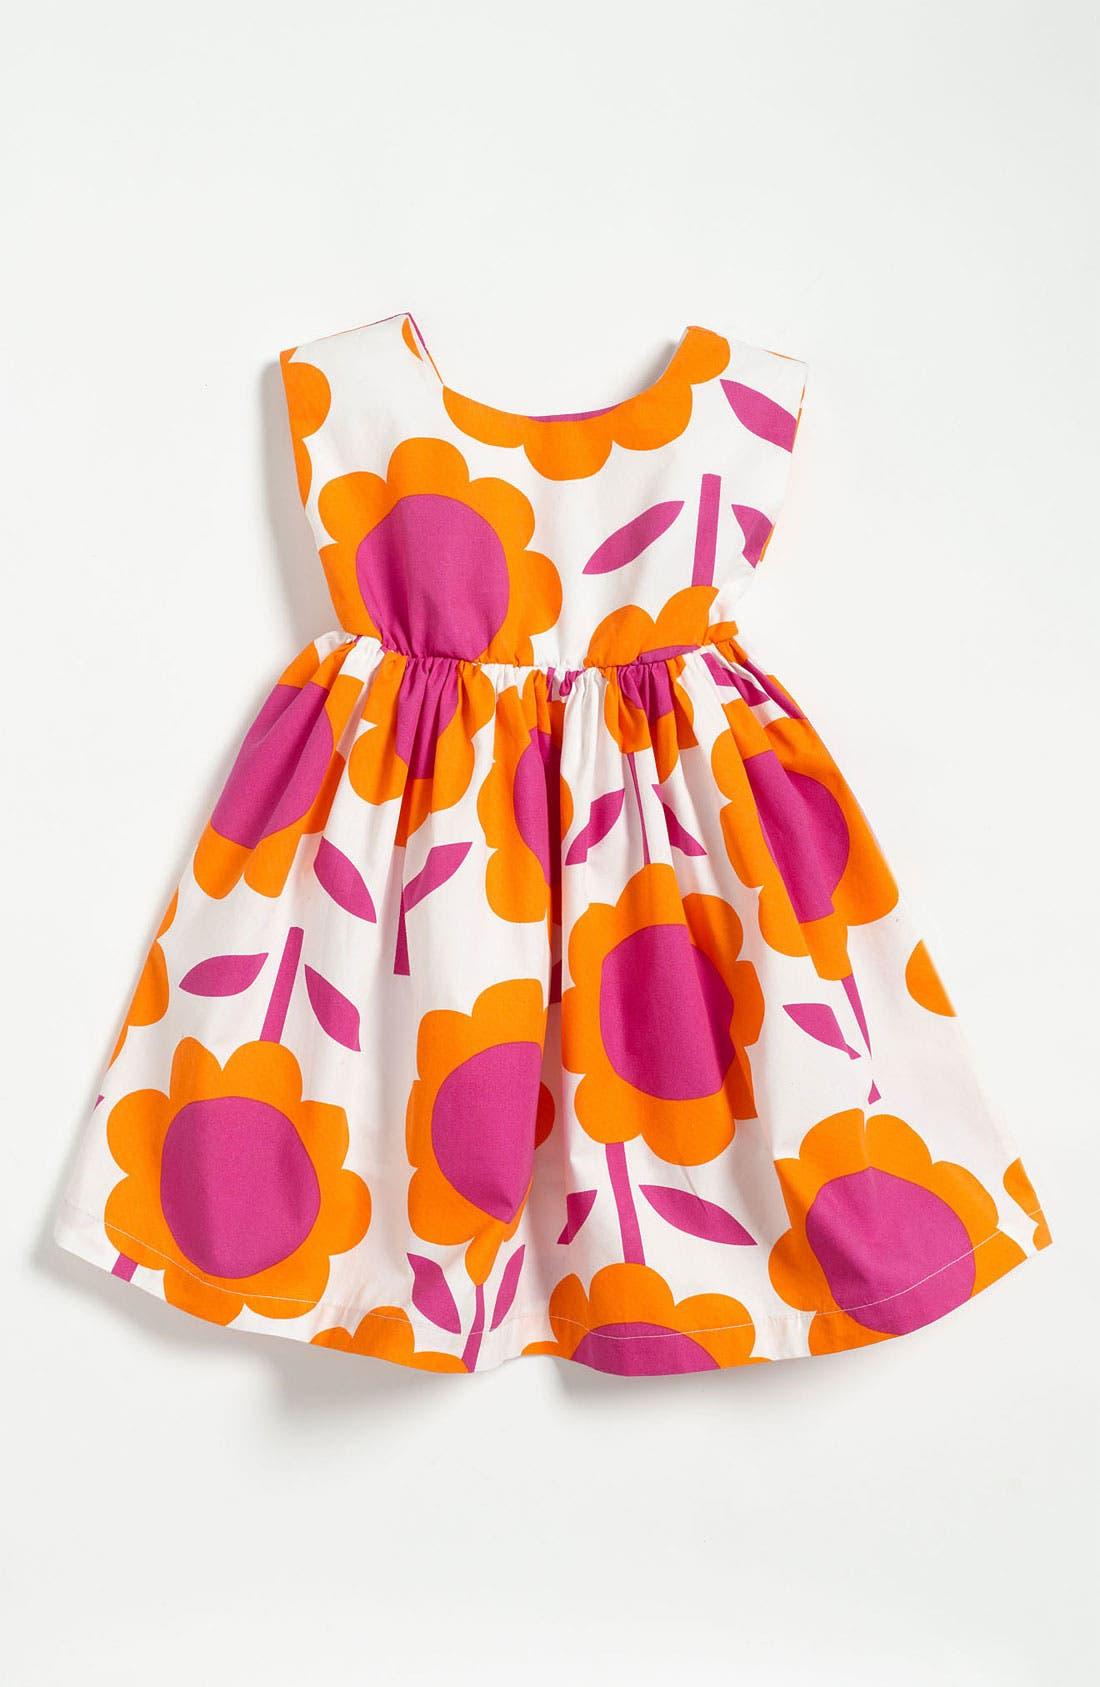 Alternate Image 1 Selected - Mignone Print Dress (Toddler)